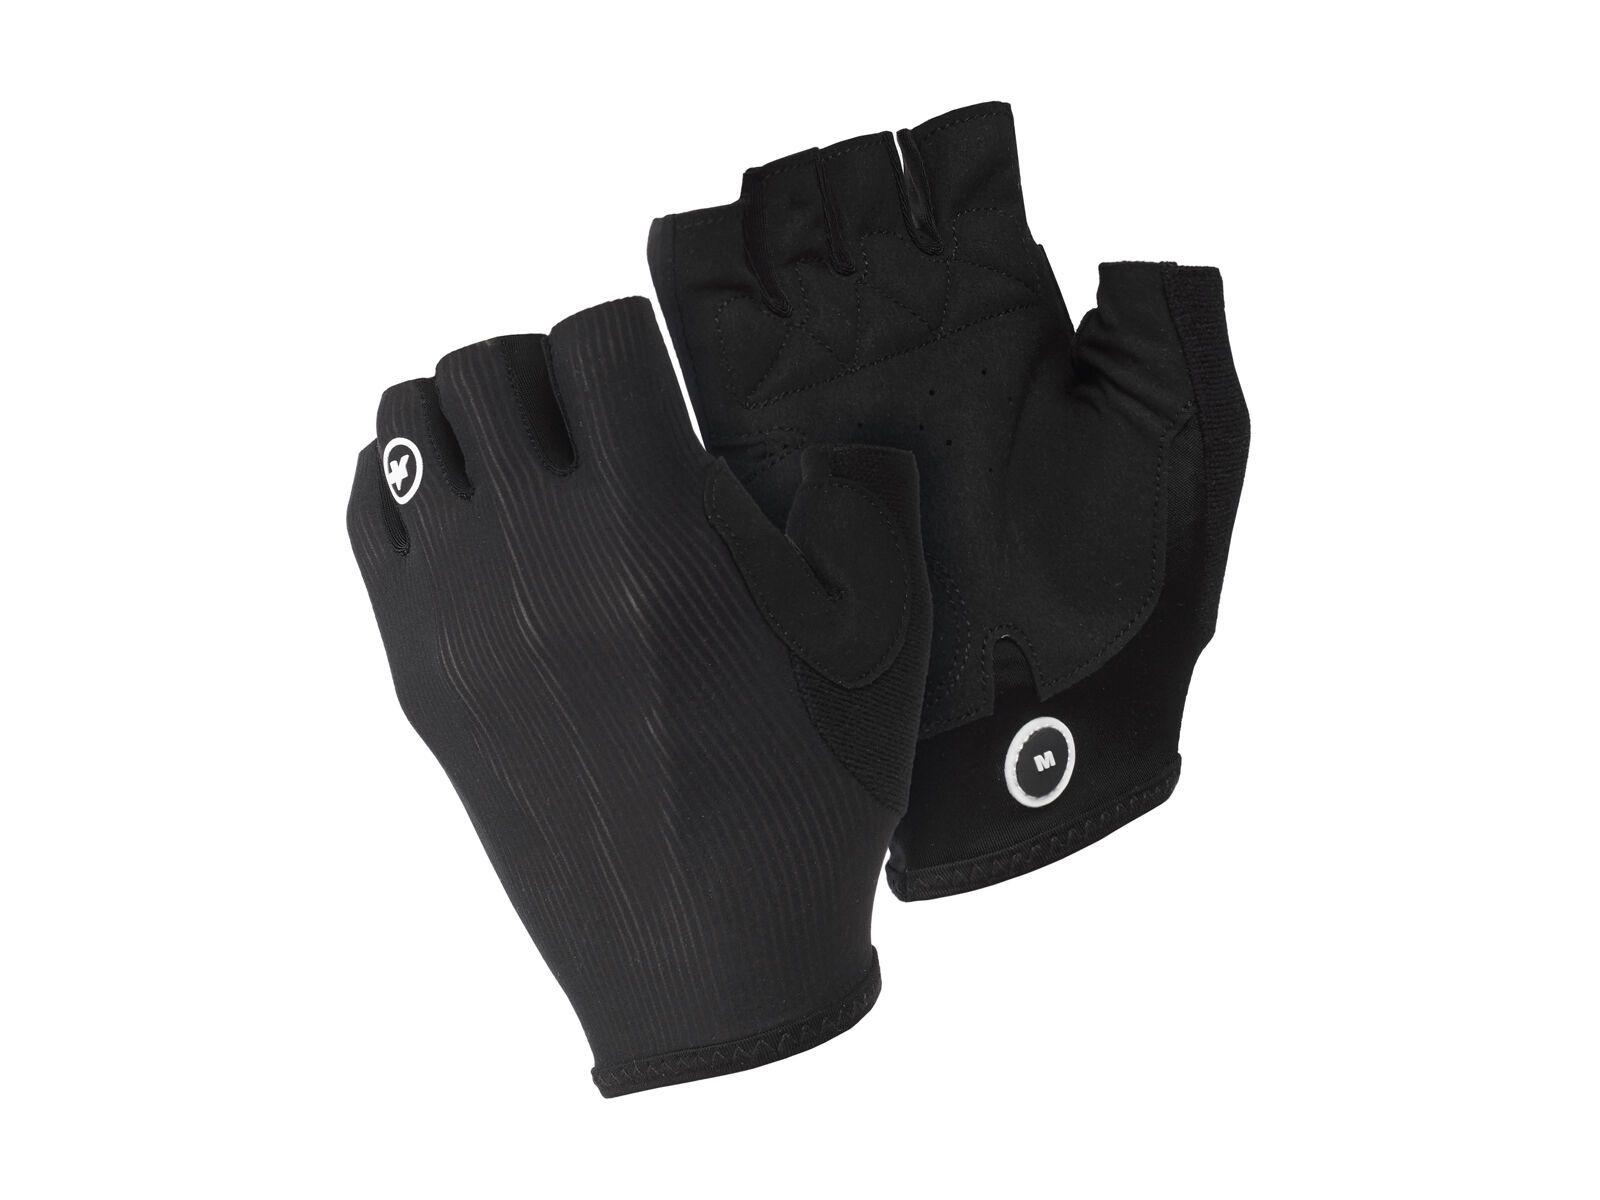 Assos RS Aero SF Gloves blackseries L P13.50.527.18.L